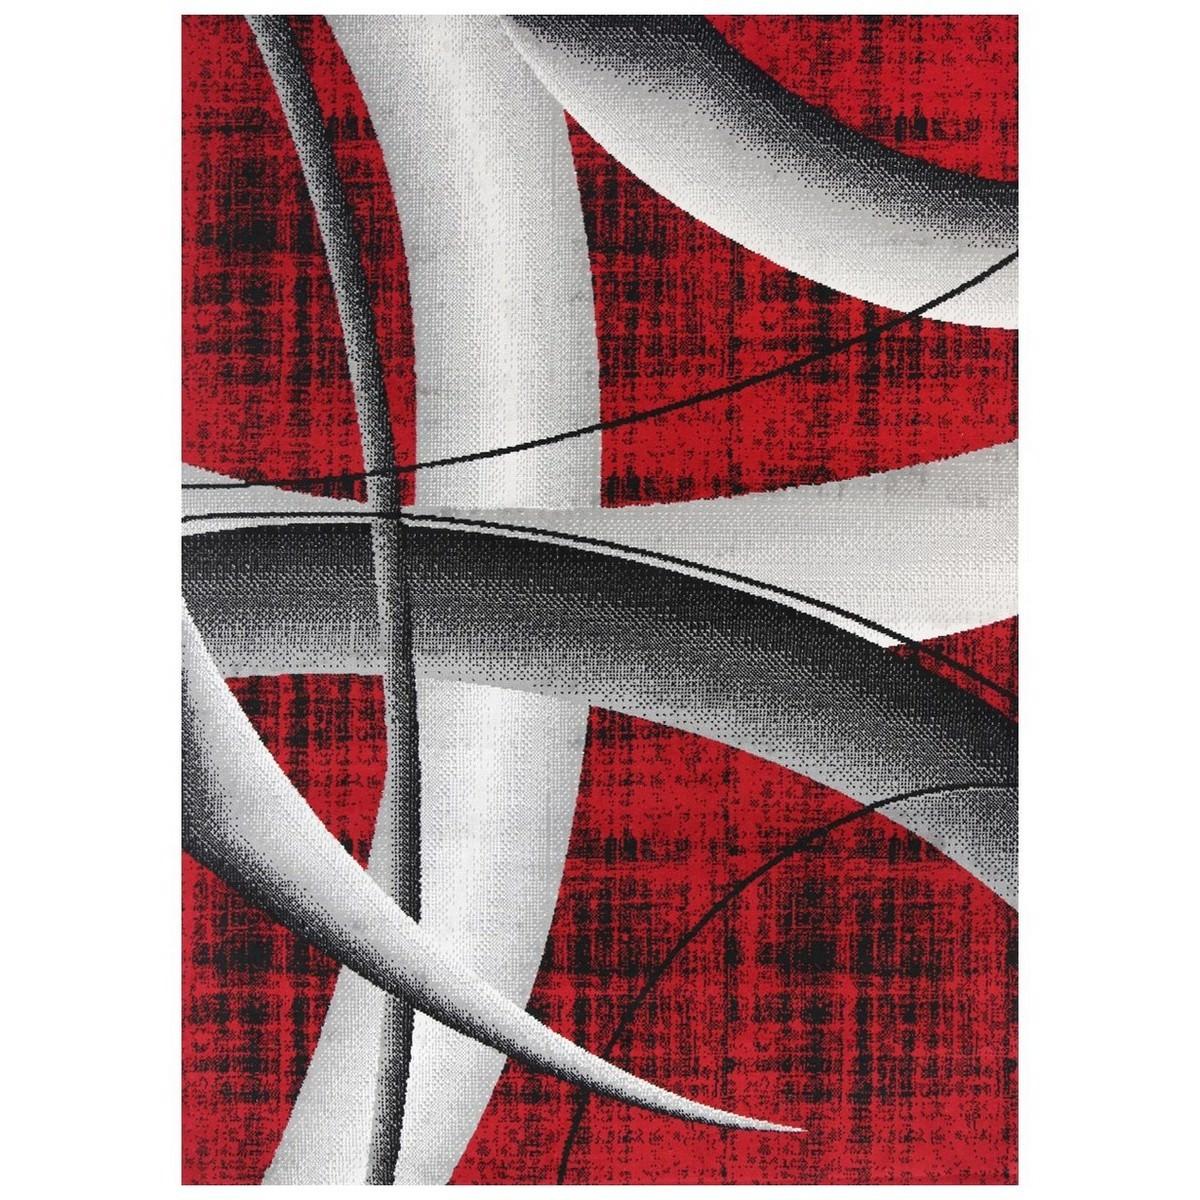 Allure Artistic Modern Rug, 160x230cm, Red